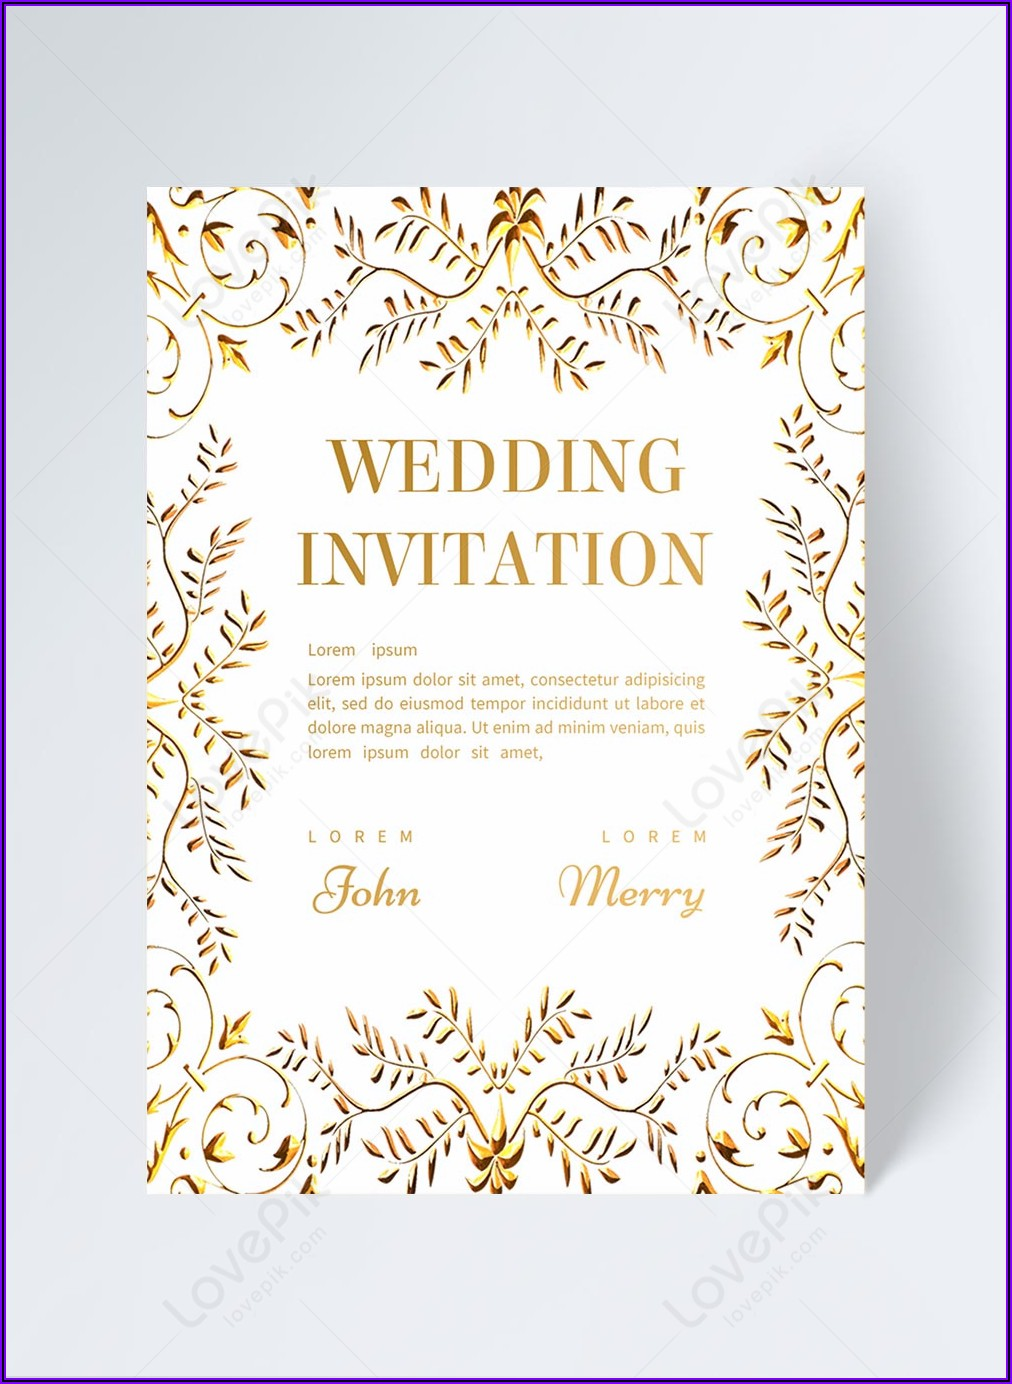 Golden Floral Wedding Invitation Template Free